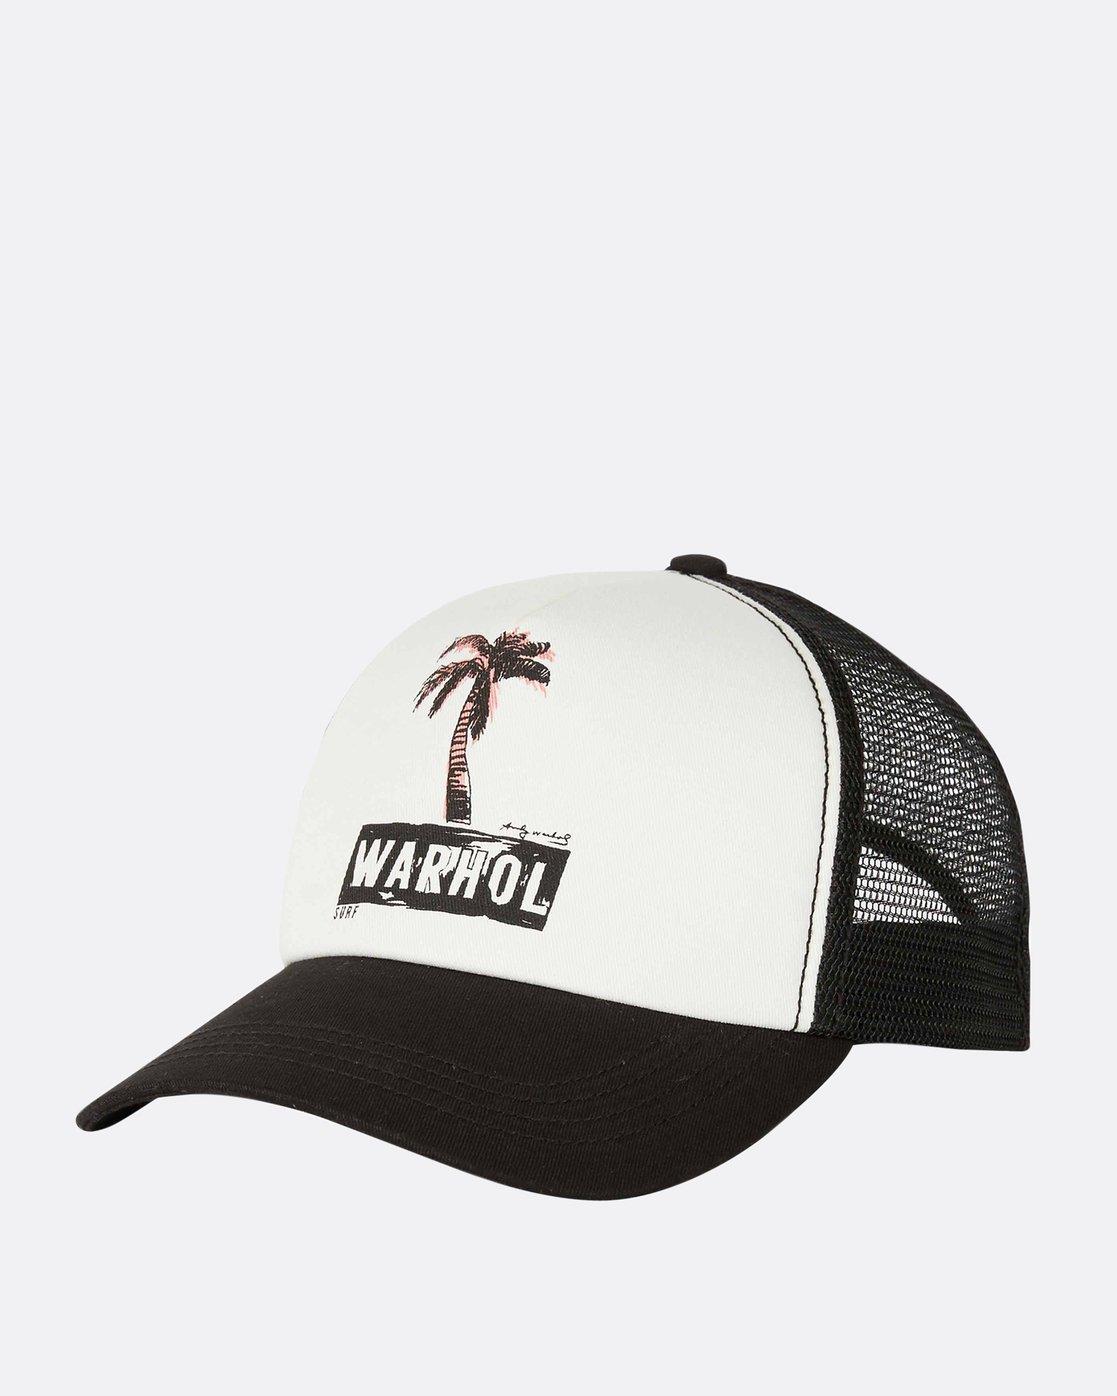 a6d5244b8b5a3f 0 Warholsurf Holly Trucker Hat JAHTLHOL Billabong